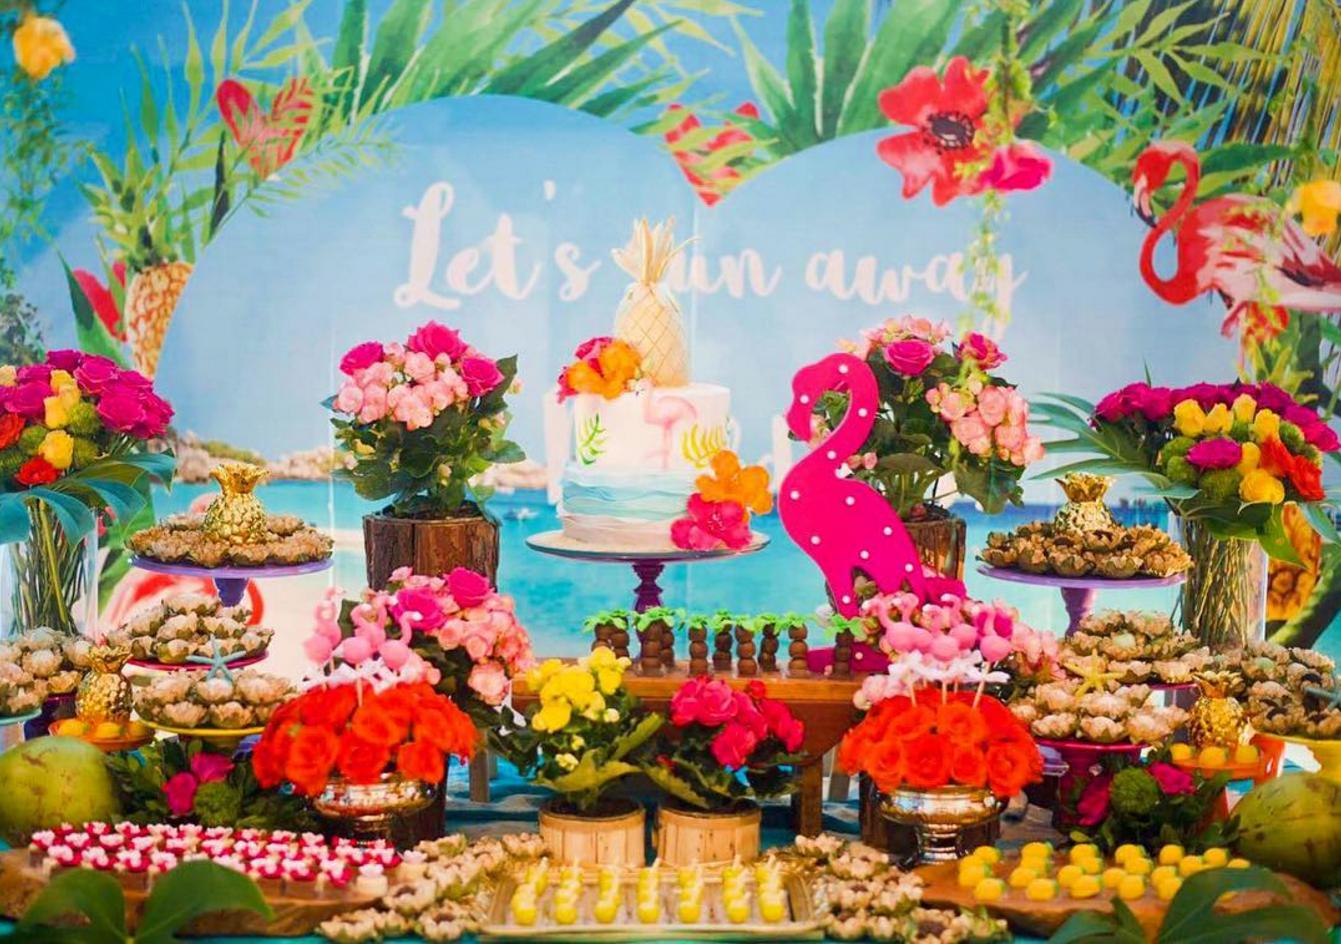 101 fiestas ideas para una fiesta tropical para tus 15 a os for Decoracion de pared para 15